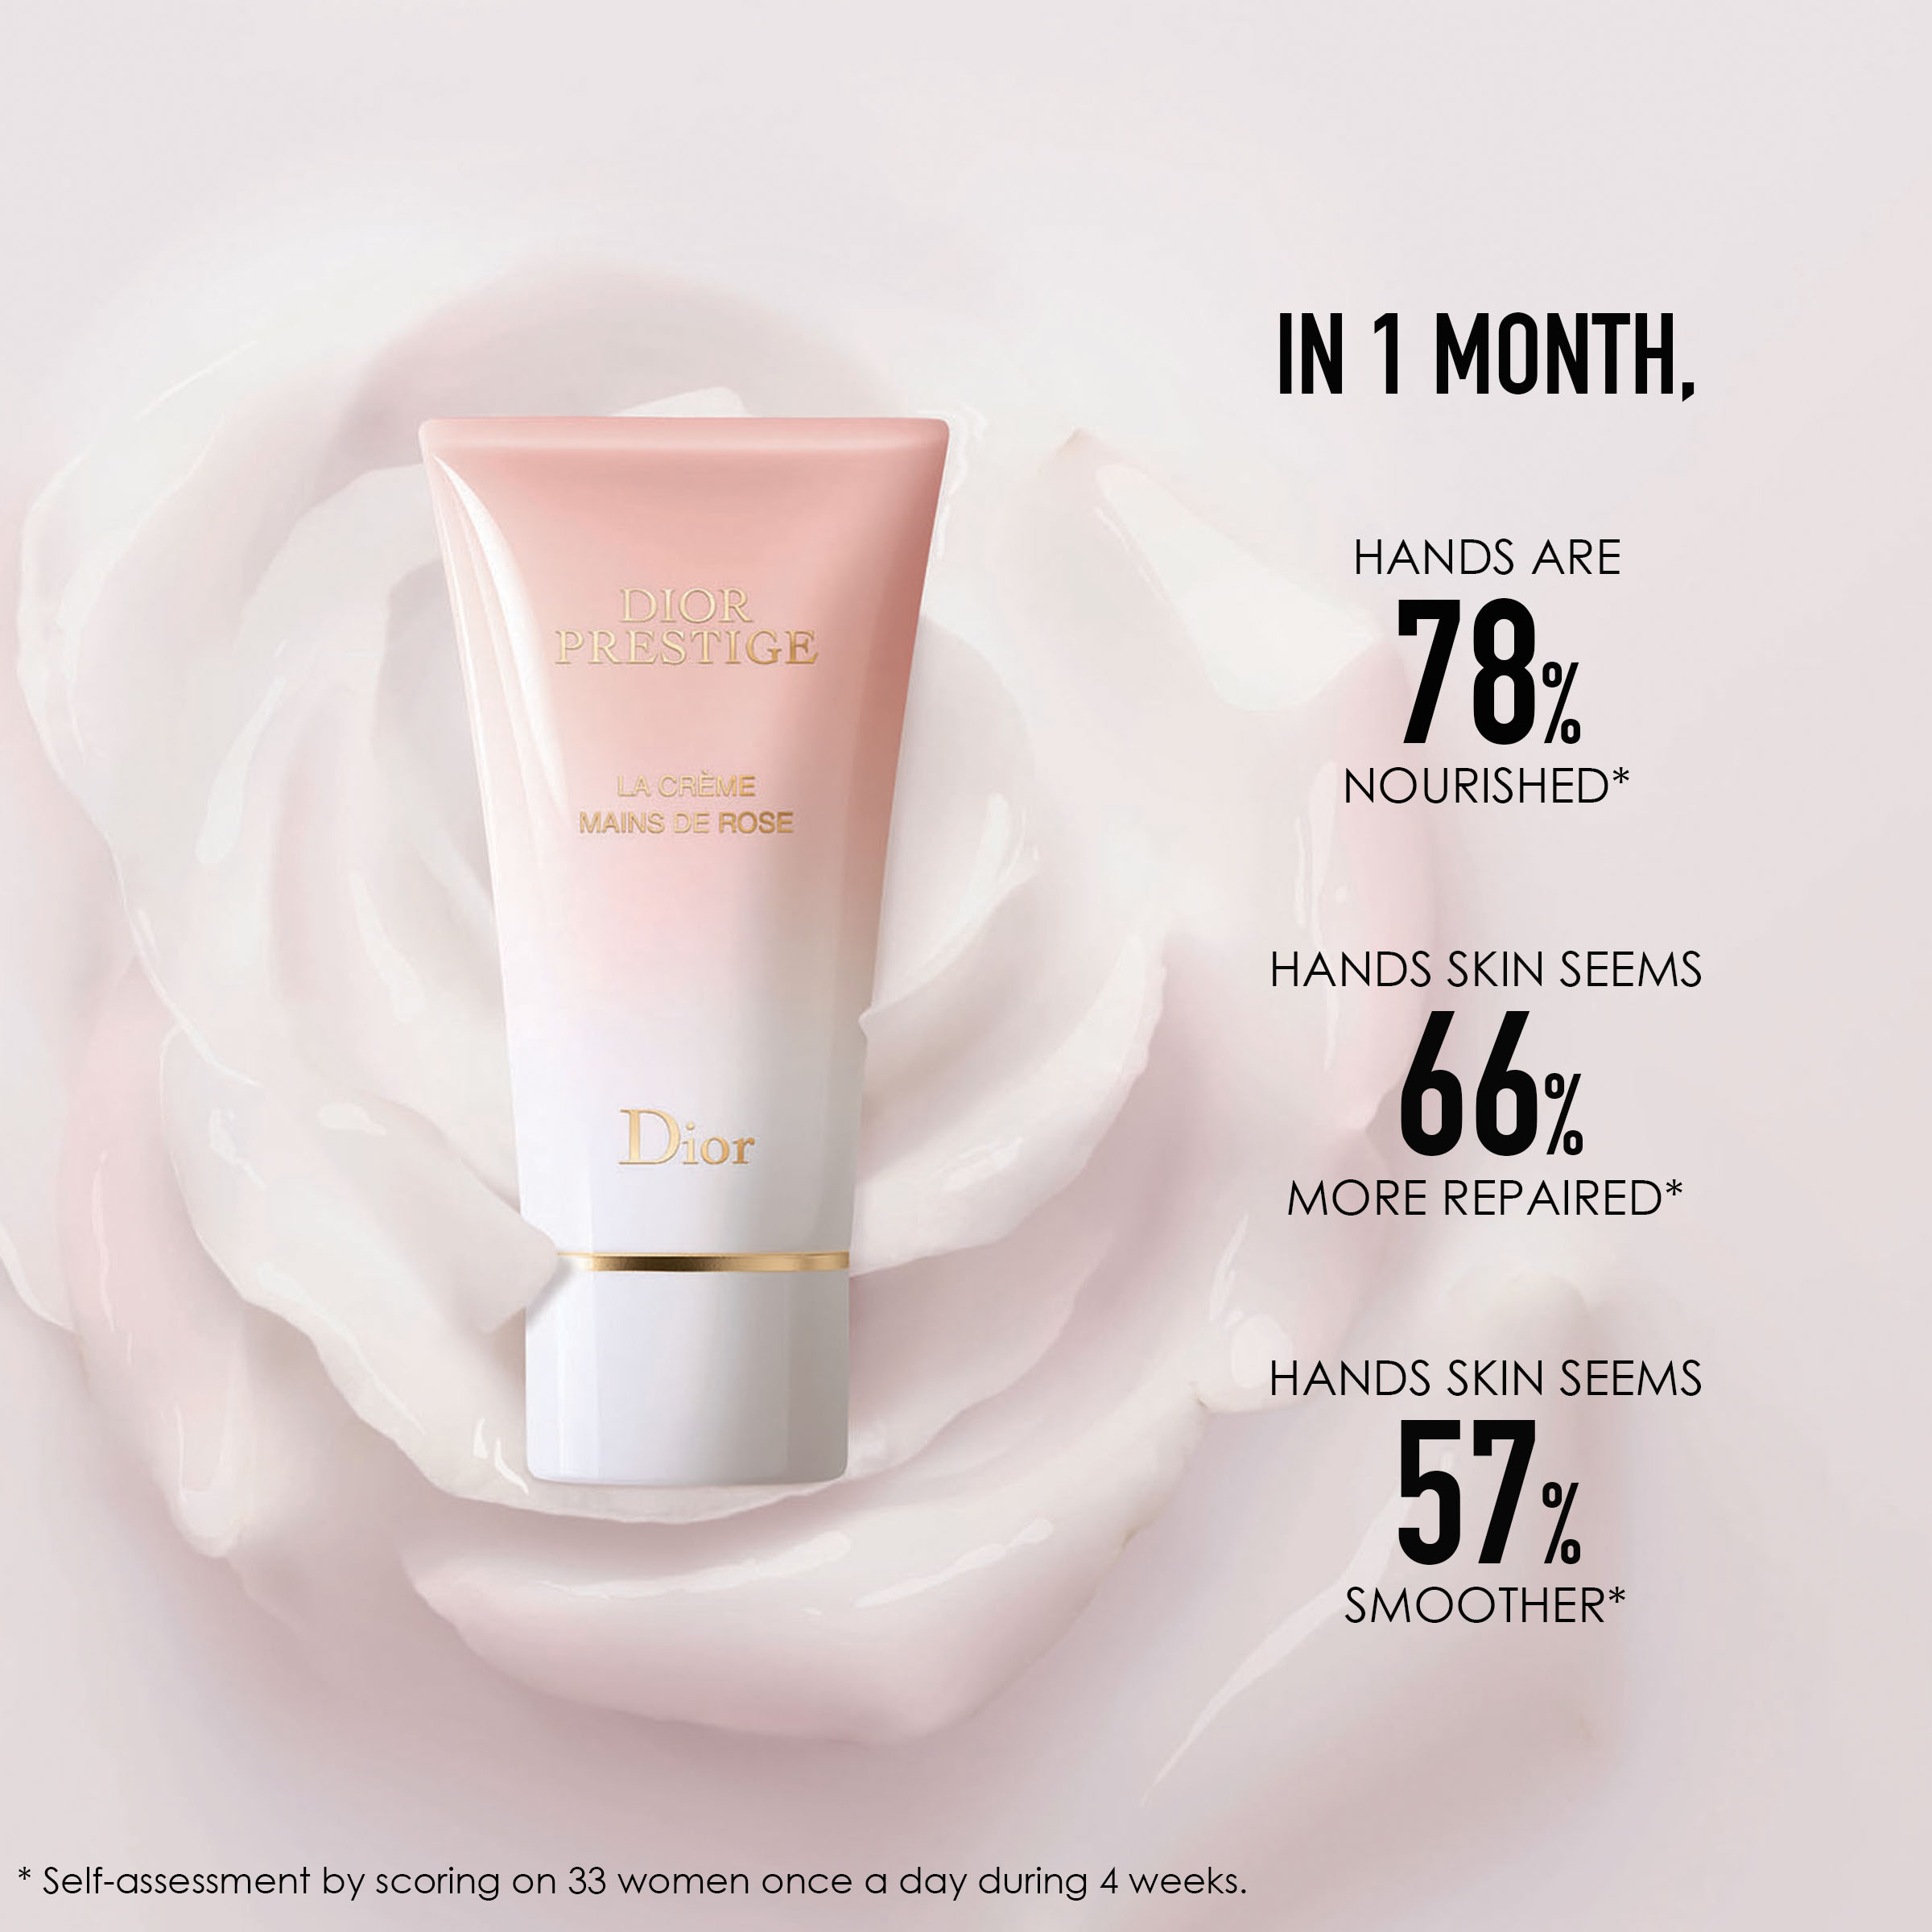 DIOR Prestige La Crème Mains de Rose Hand Creme, 50 ml